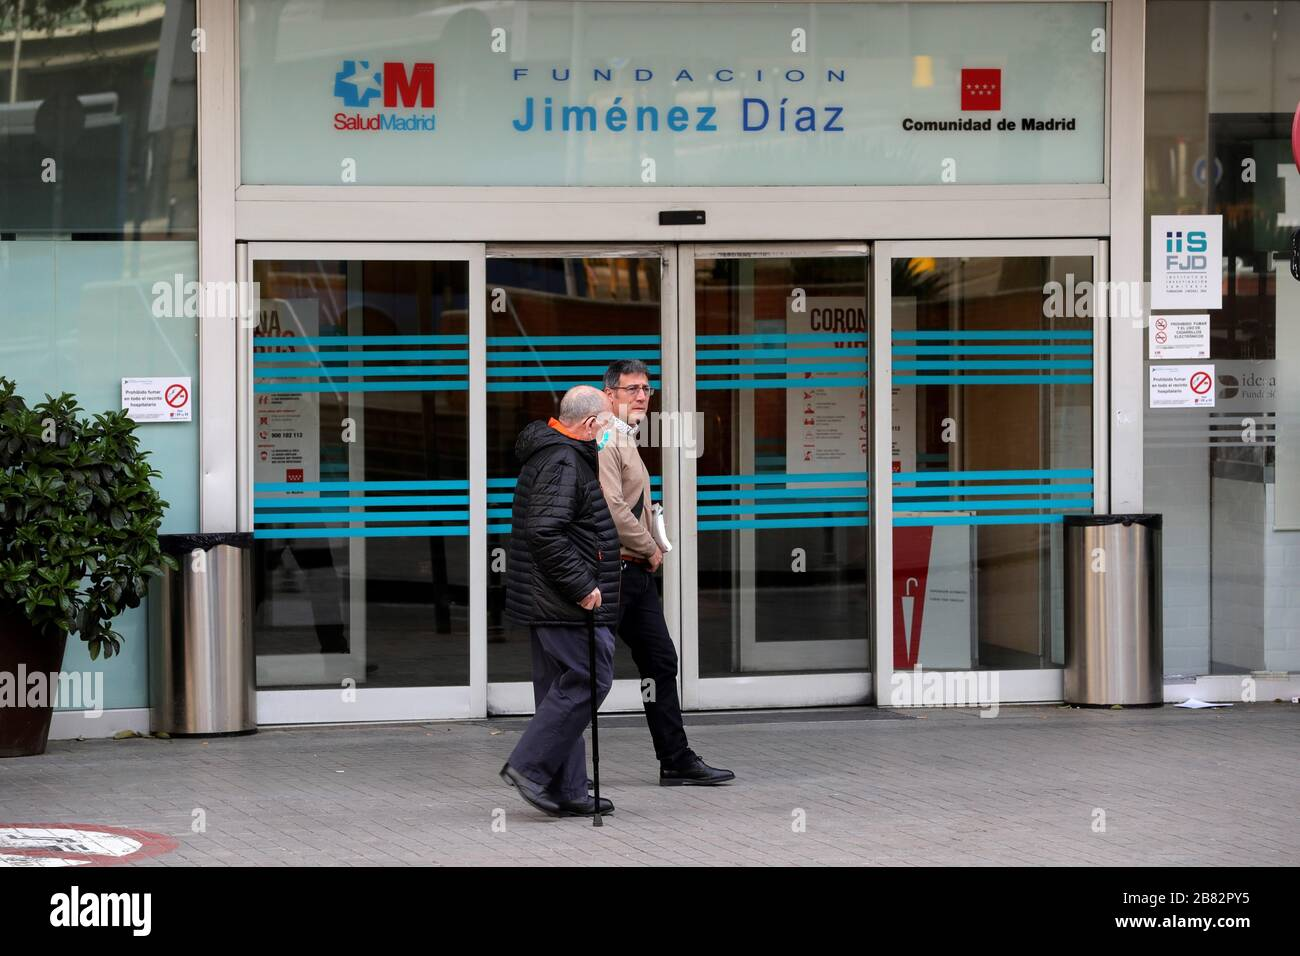 Madrid, Spain. 19th Mar, 2020. People walk outside the Jimenez Diaz Hospital in Madrid, Spain, 19 March 2020, where allegedly former Madrid Regional President Esperanza Aguirre and husband Fernando Ramirez have checked in for coronavirus. Credit: JUANJO MARTIN/EFE/Alamy Live News Stock Photo